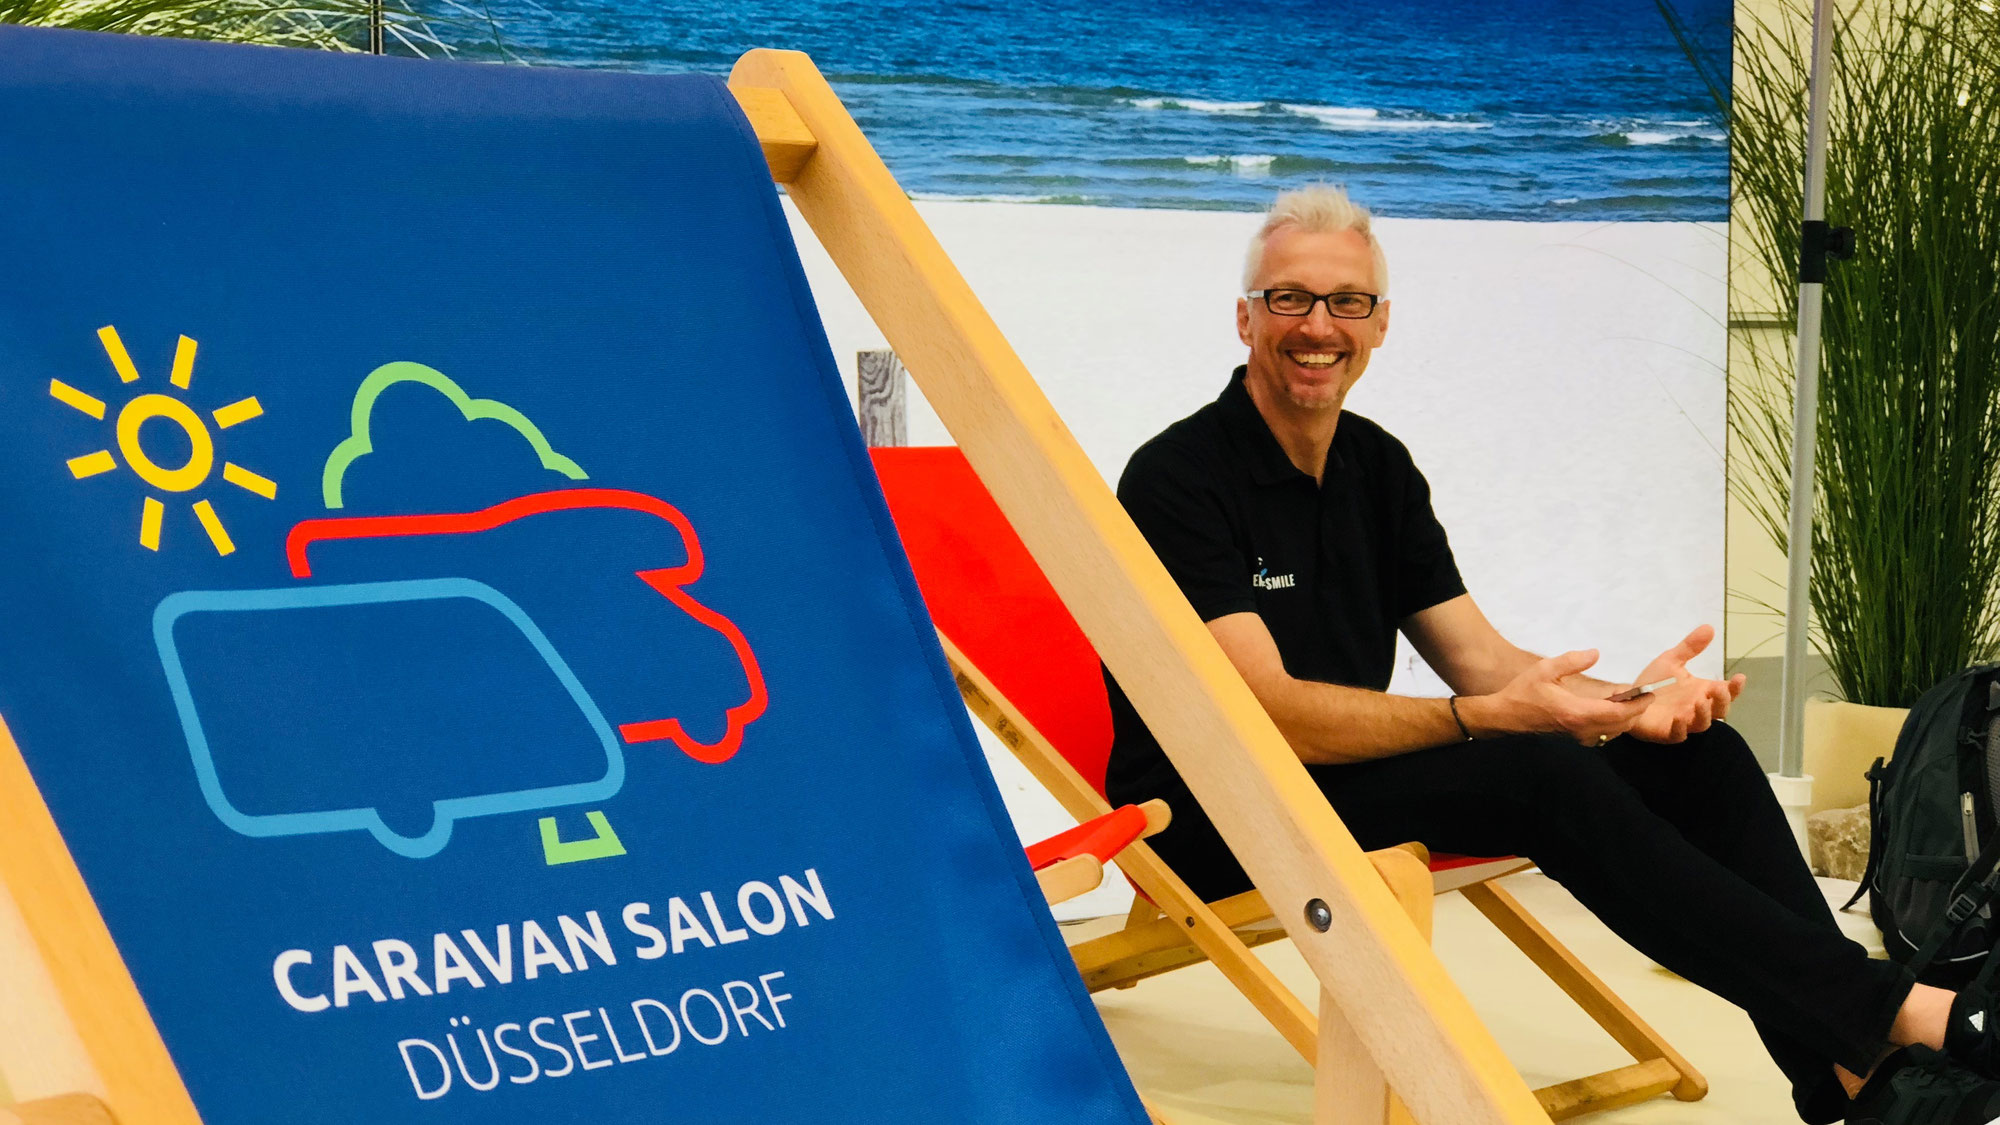 Caravan Salon Düsseldorf 2018 (Teil 2)...